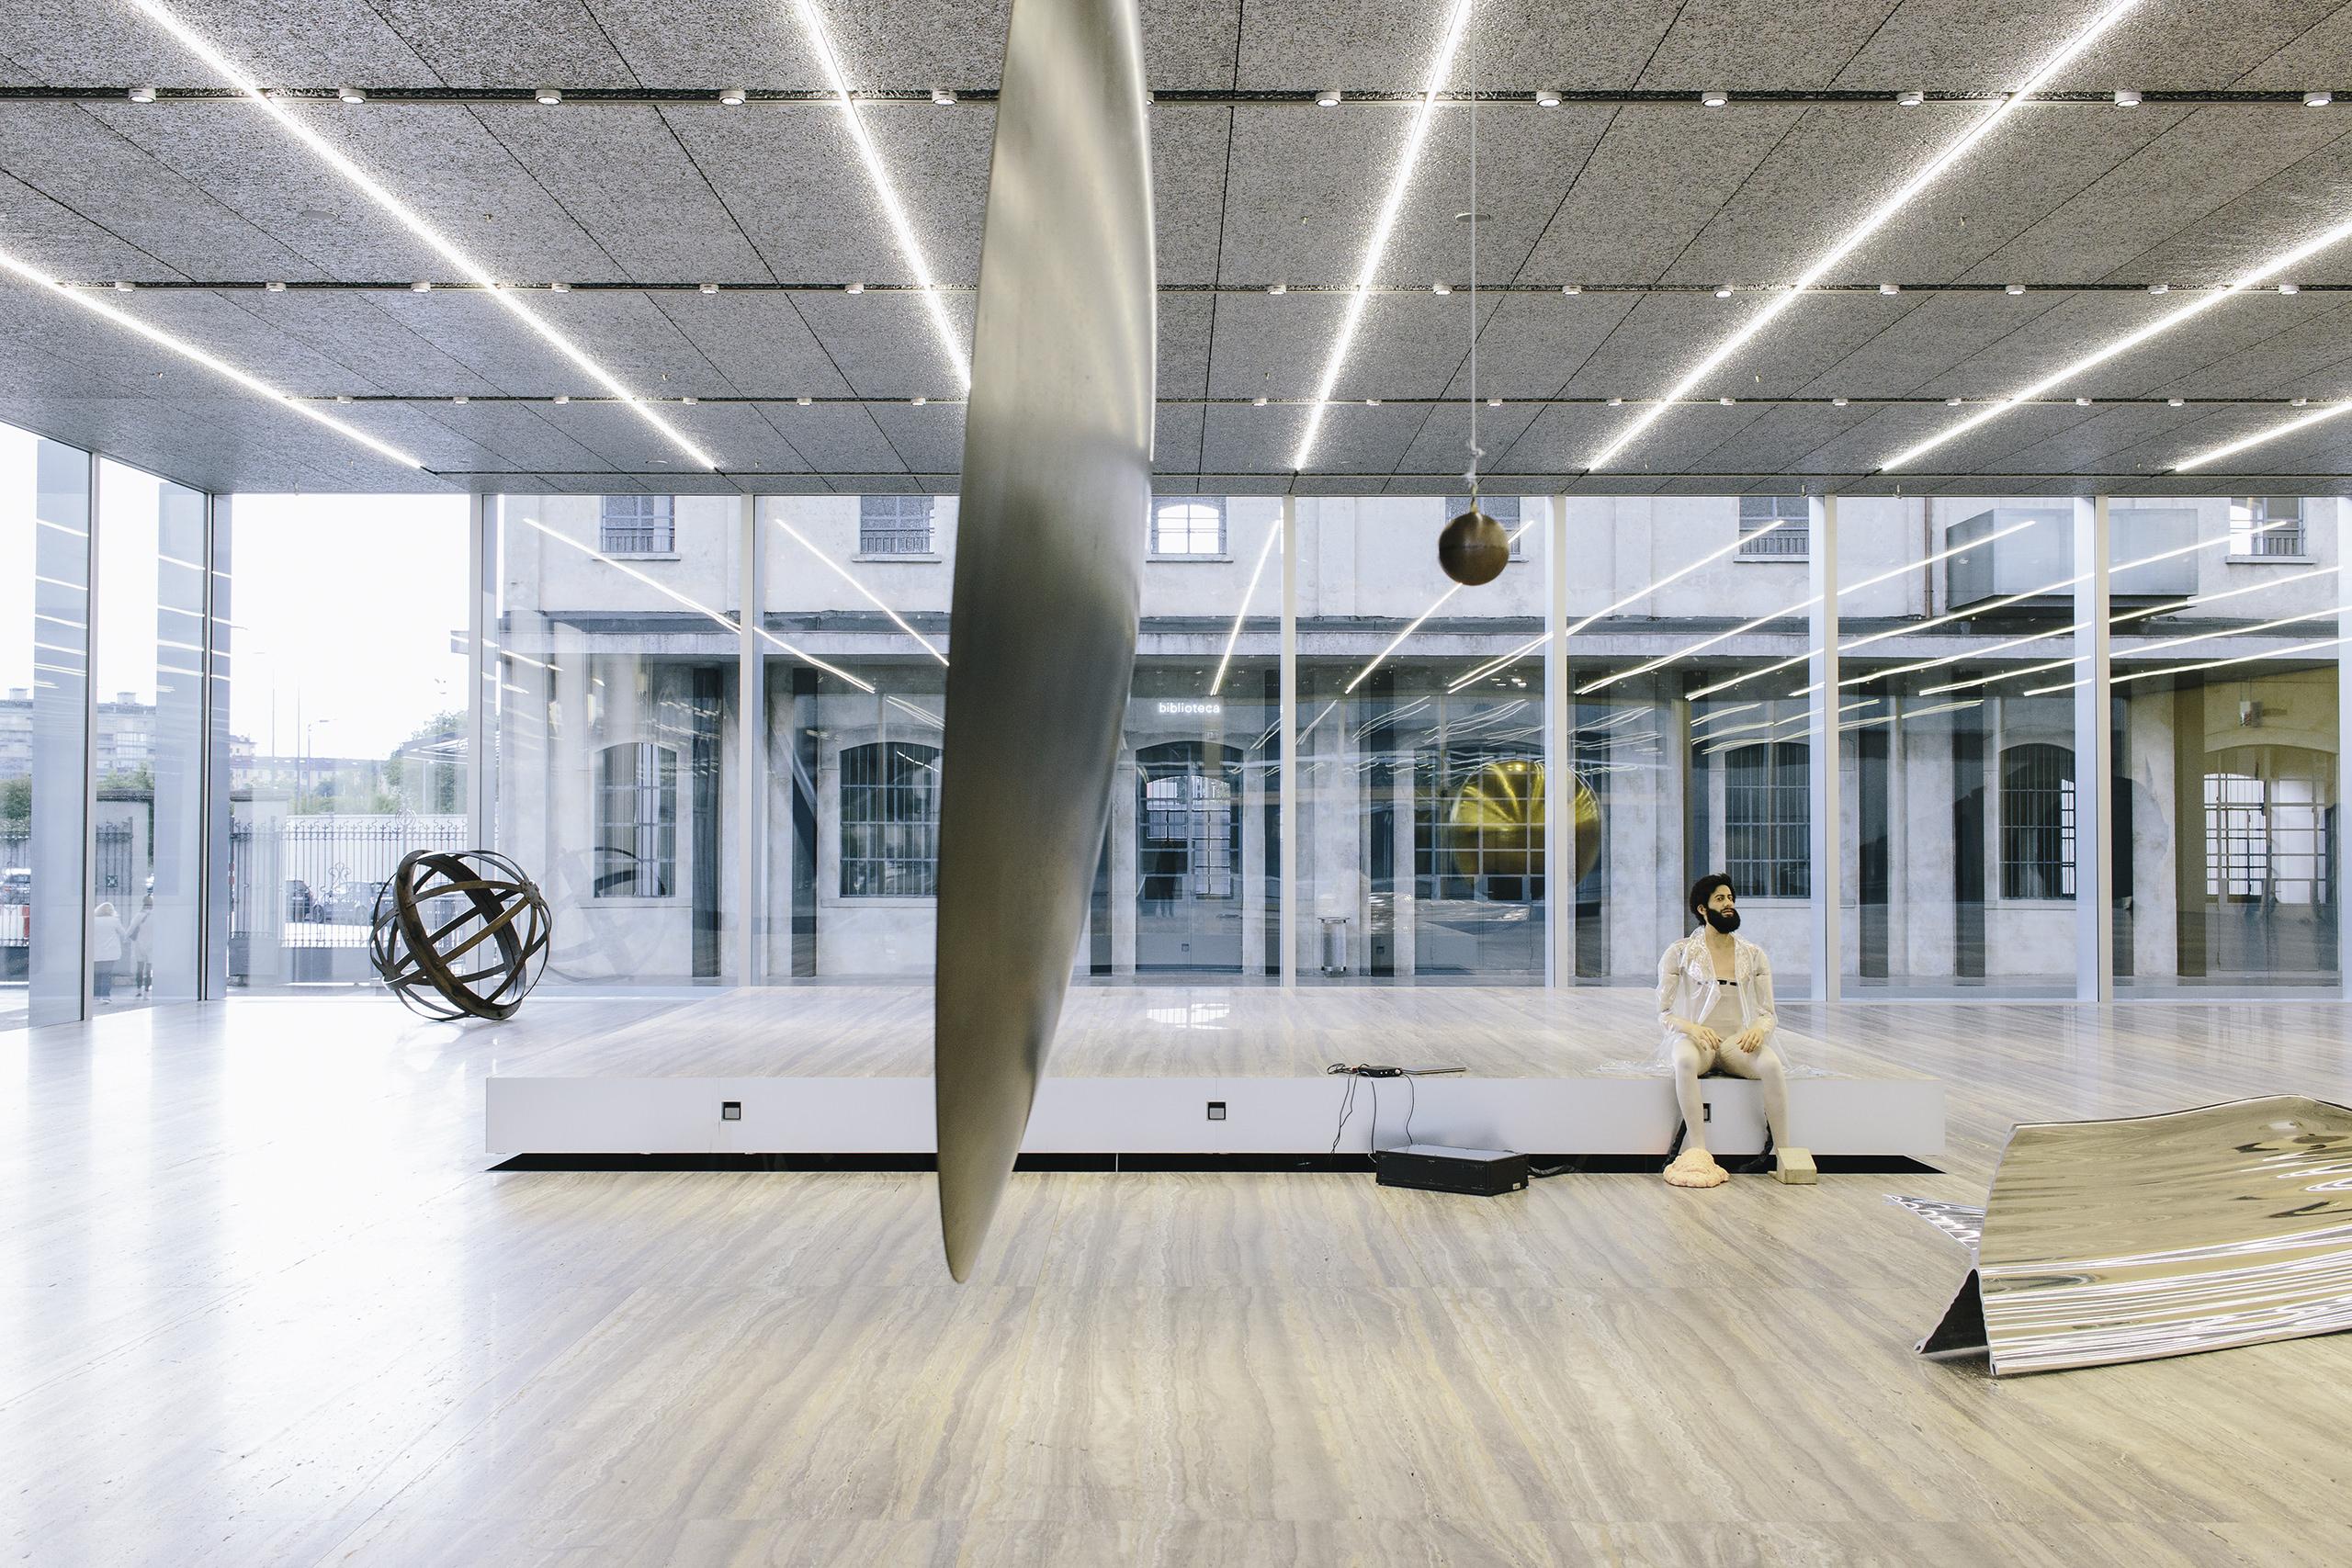 Fondazione-Prada-4